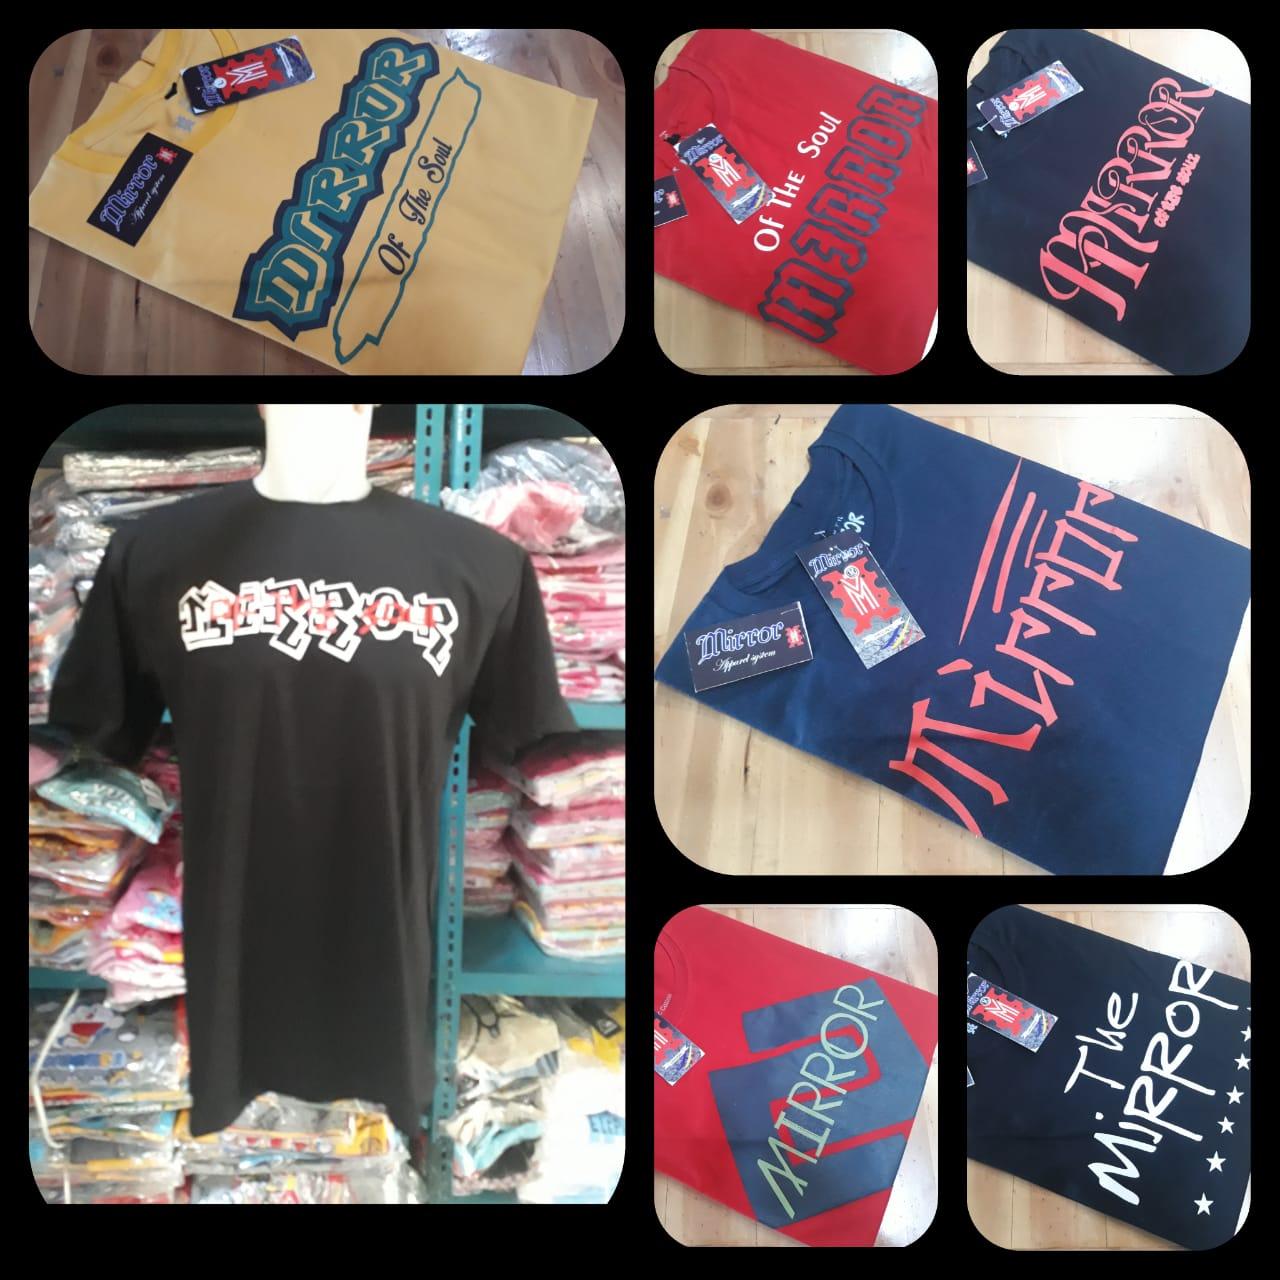 Sentra Produsen Kaos Distro Mirror Brand Dewasa Terbaru Murah di Bandung 34Ribu